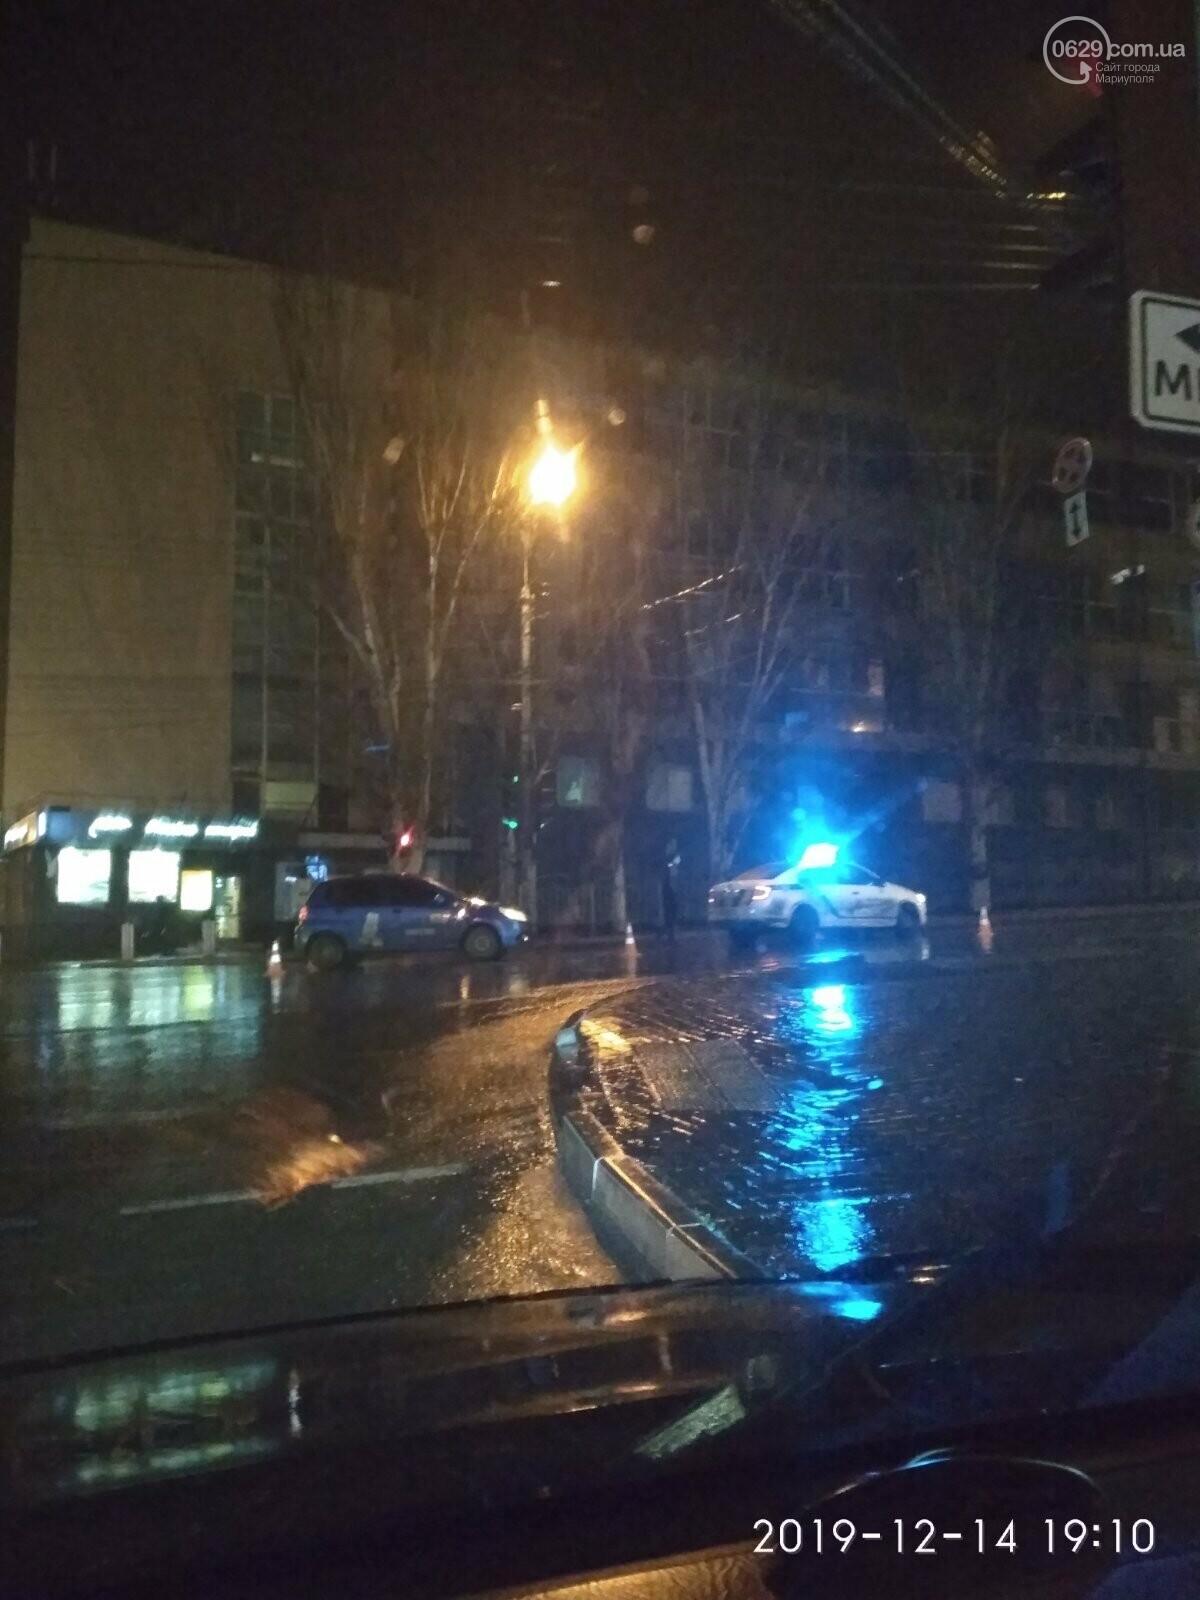 В Мариуполе ухудшилась ситуация на дорогах.  Четвертая авария за вечер, - ФОТО, фото-2